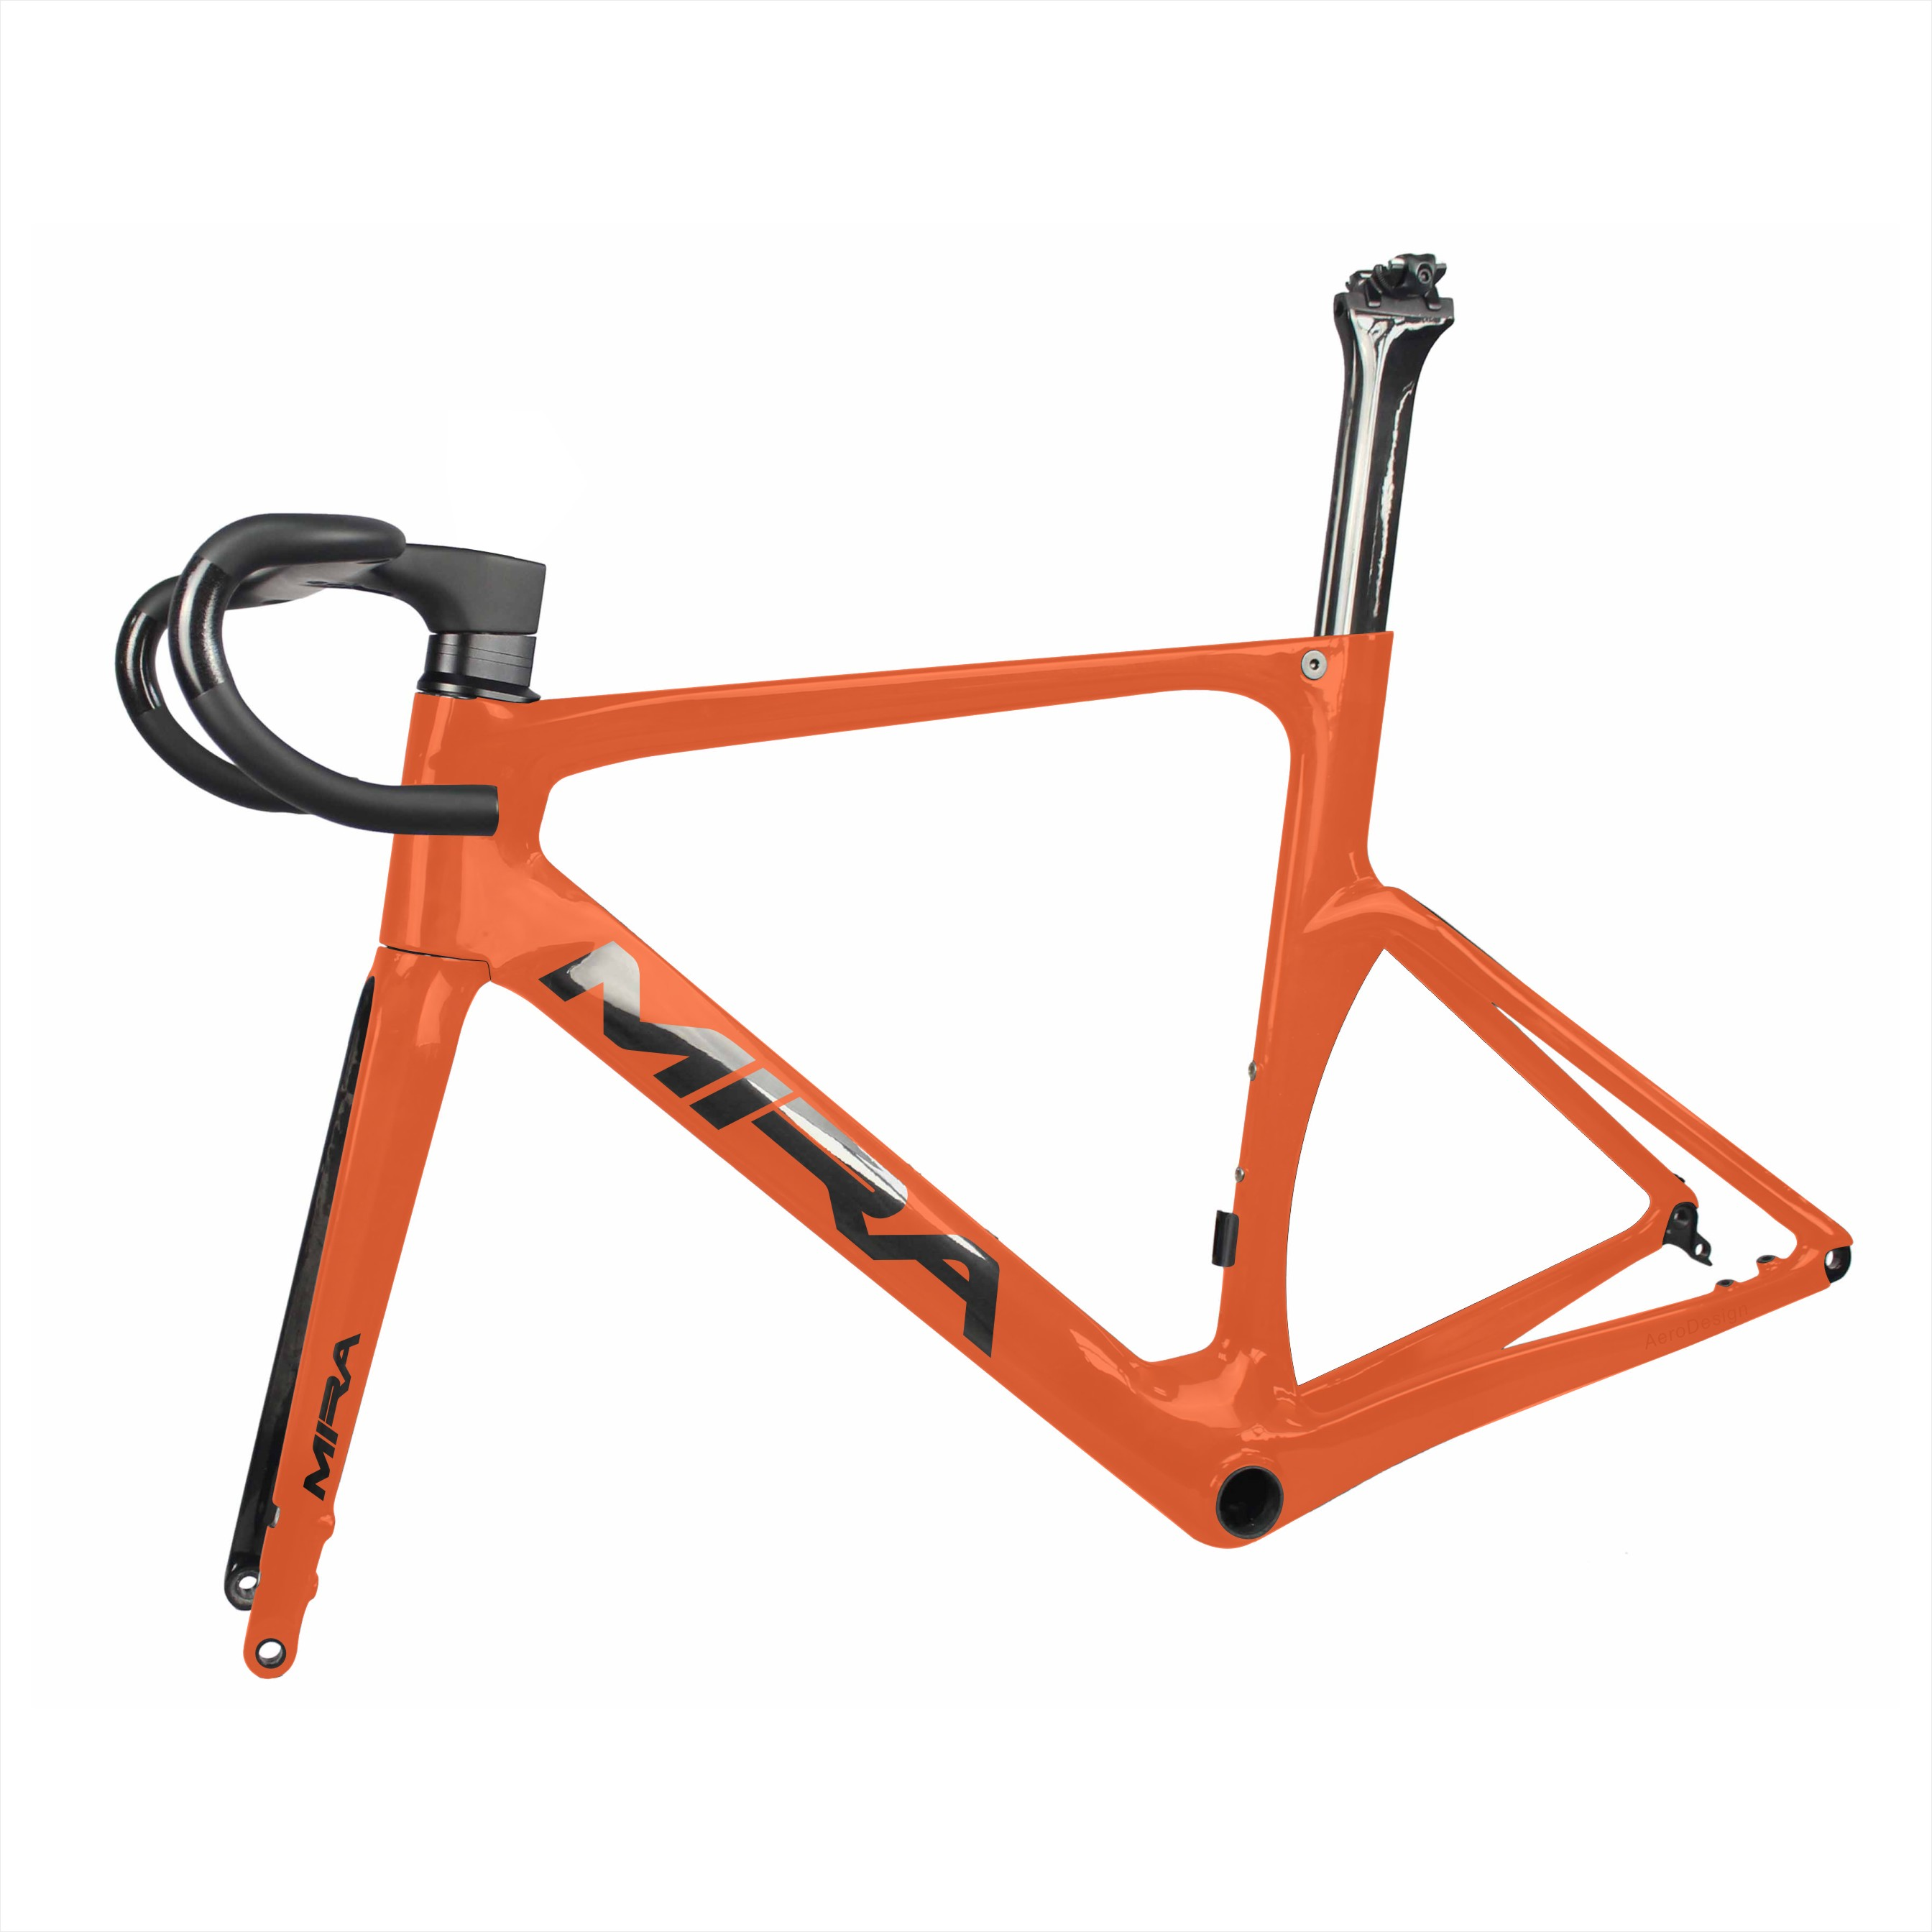 AERO  Flat Mount Disc Road Bike Frame ,warranty 2 Years Full Carbon Bicycle Frame In Disc Brake,China Carbon Frame